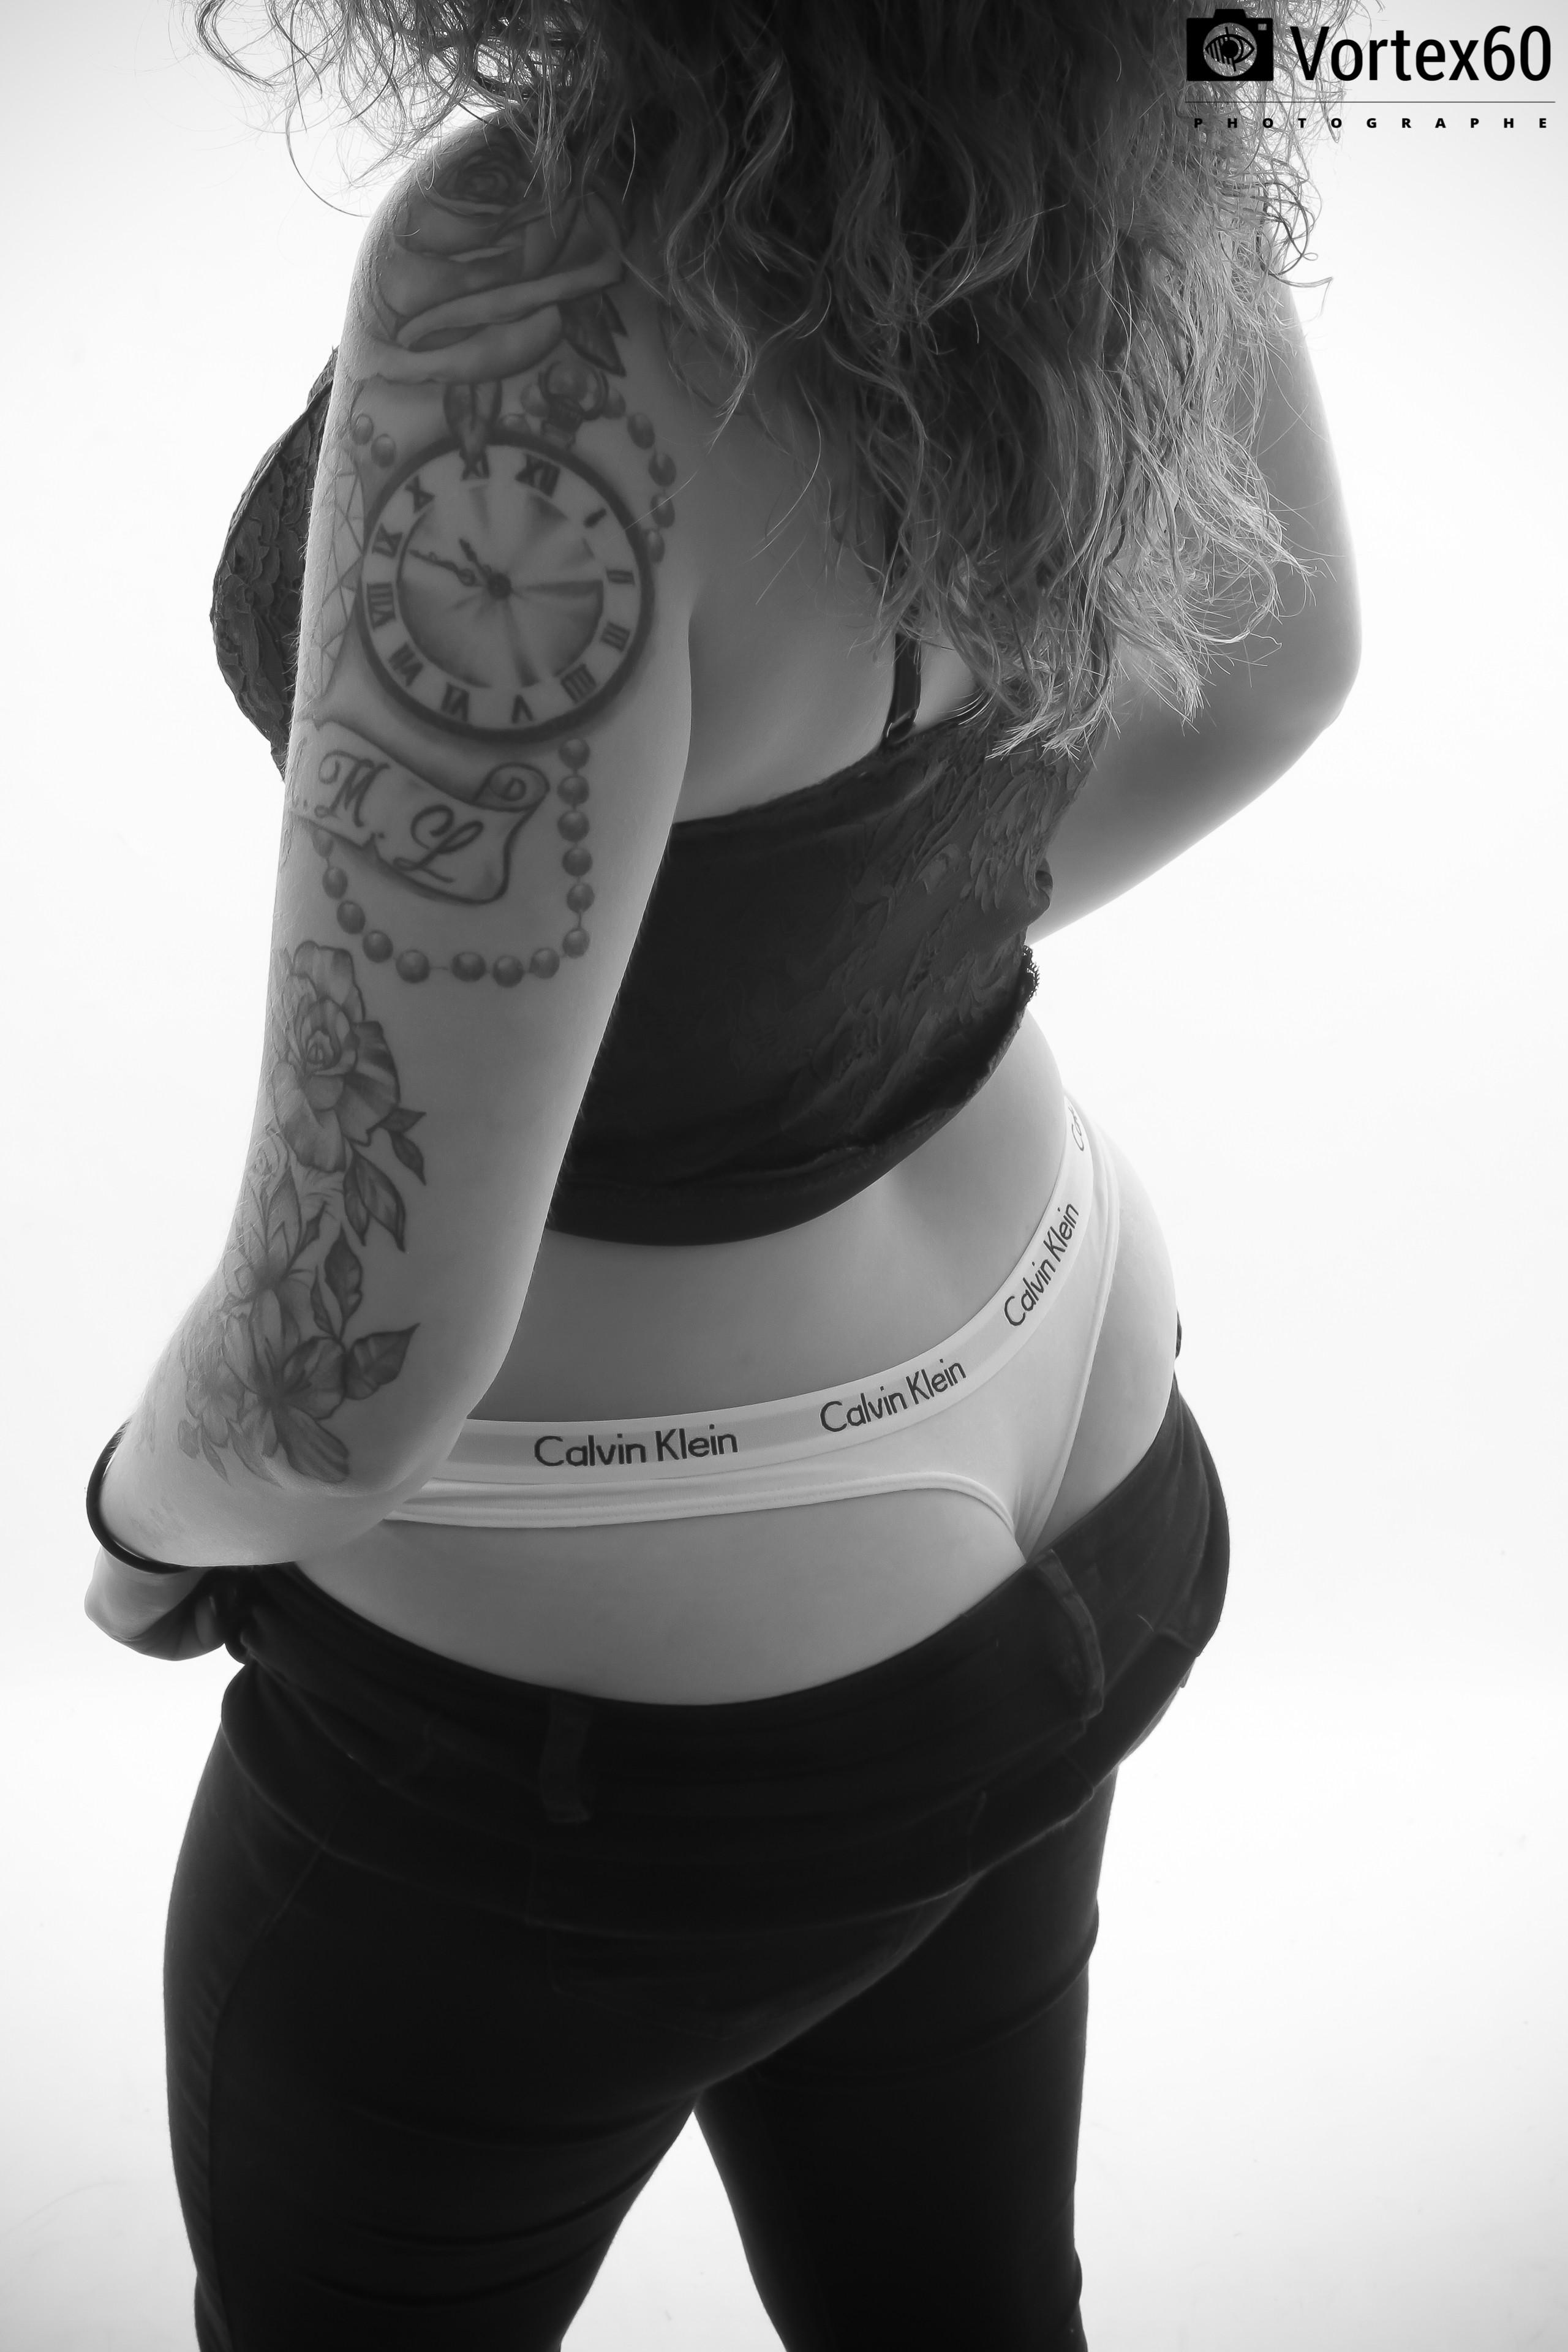 Calvin Klein and Tatoo by Vortex60 Photographe